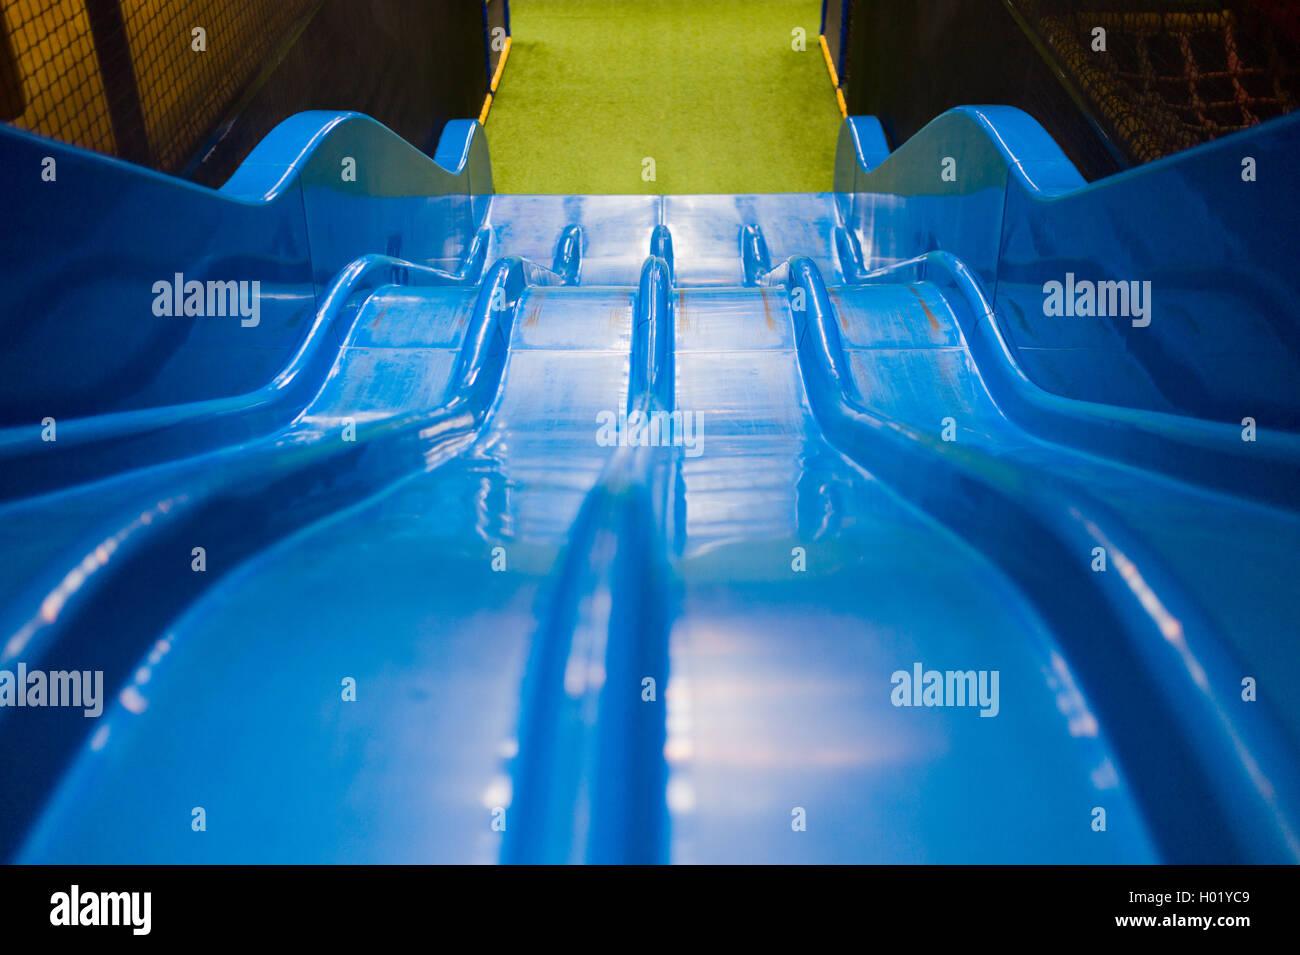 Kinderrutschen - Kinder-Indoor-Playgroung blau Stockfoto, Bild ...